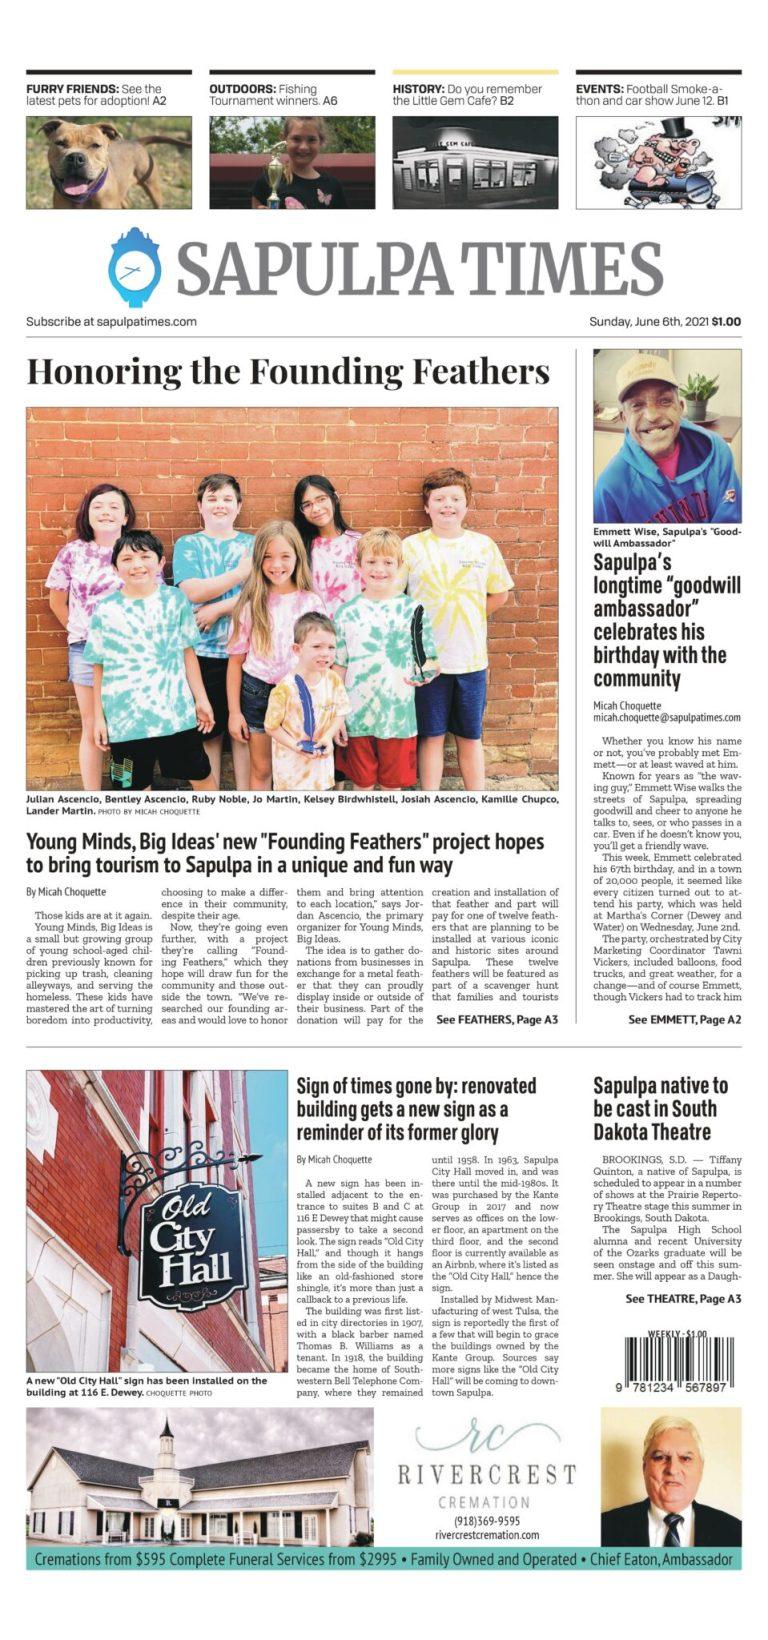 Sapulpa Times Digital Edition 06/06/2021